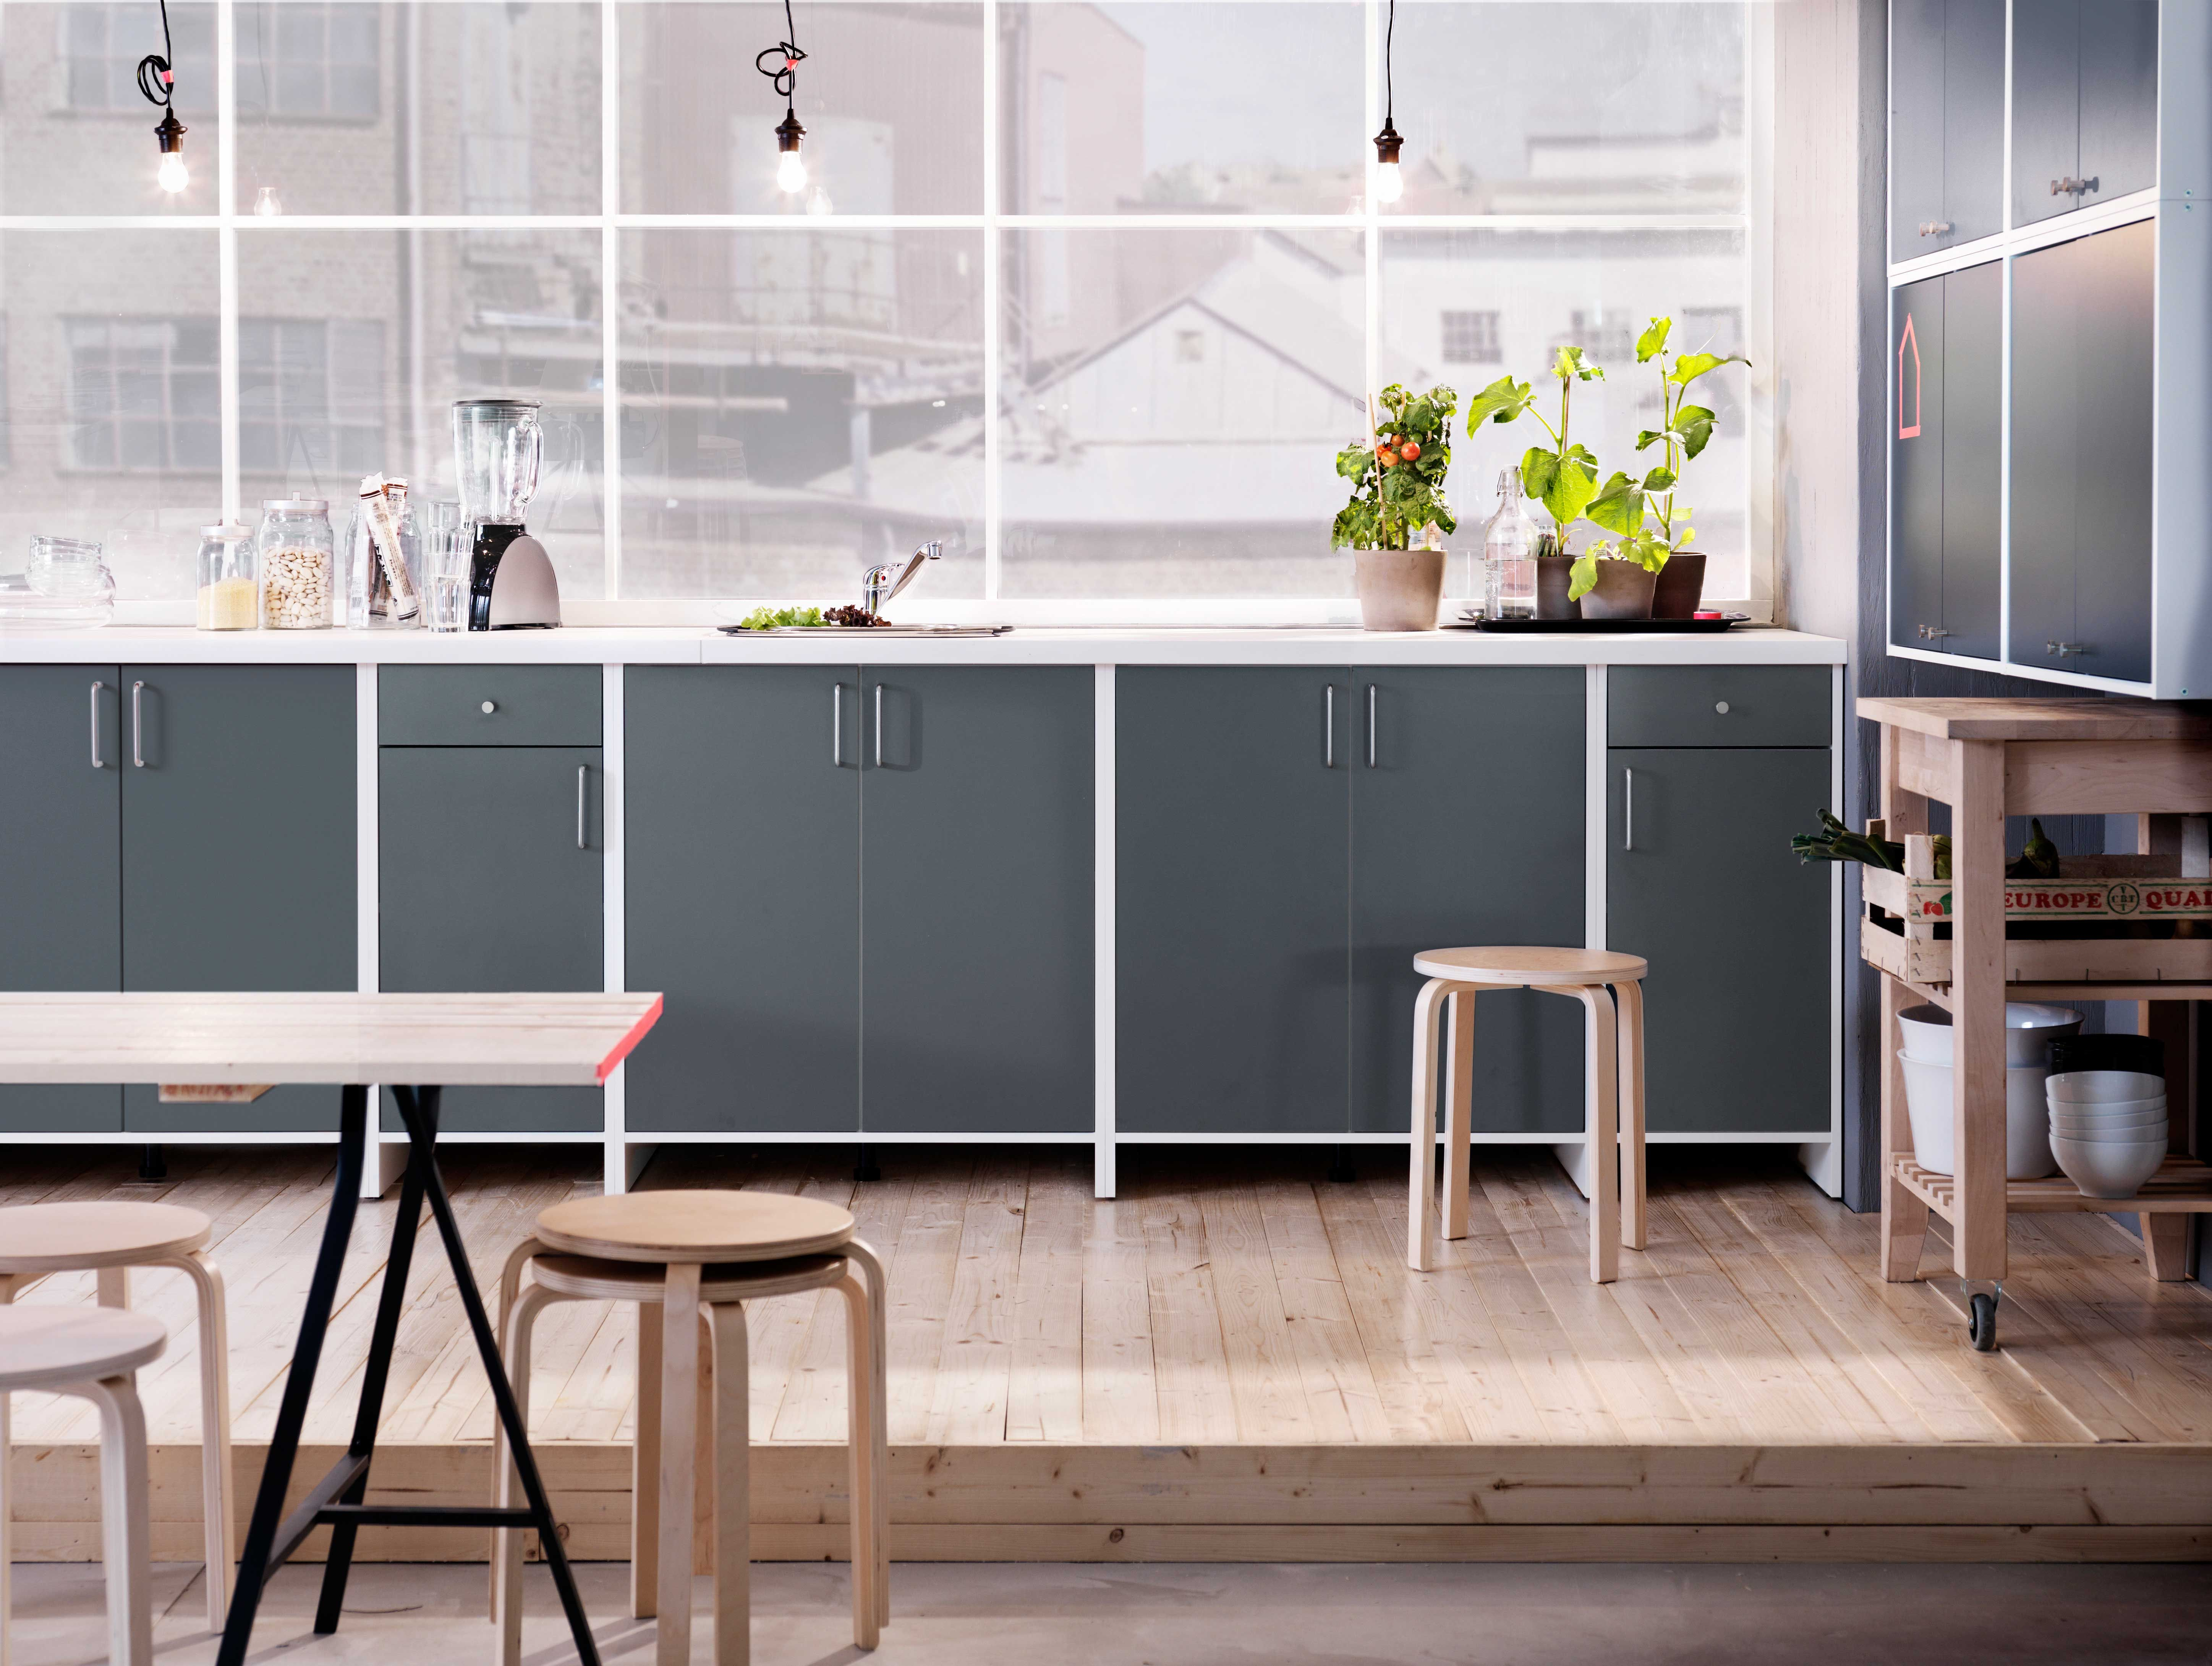 Kuche Fur Jeden Geschmack Stil Gunstig Kaufen Arbeitsplatte Kuche Ikea Kuchen Inspiration Ikea Kuchenideen